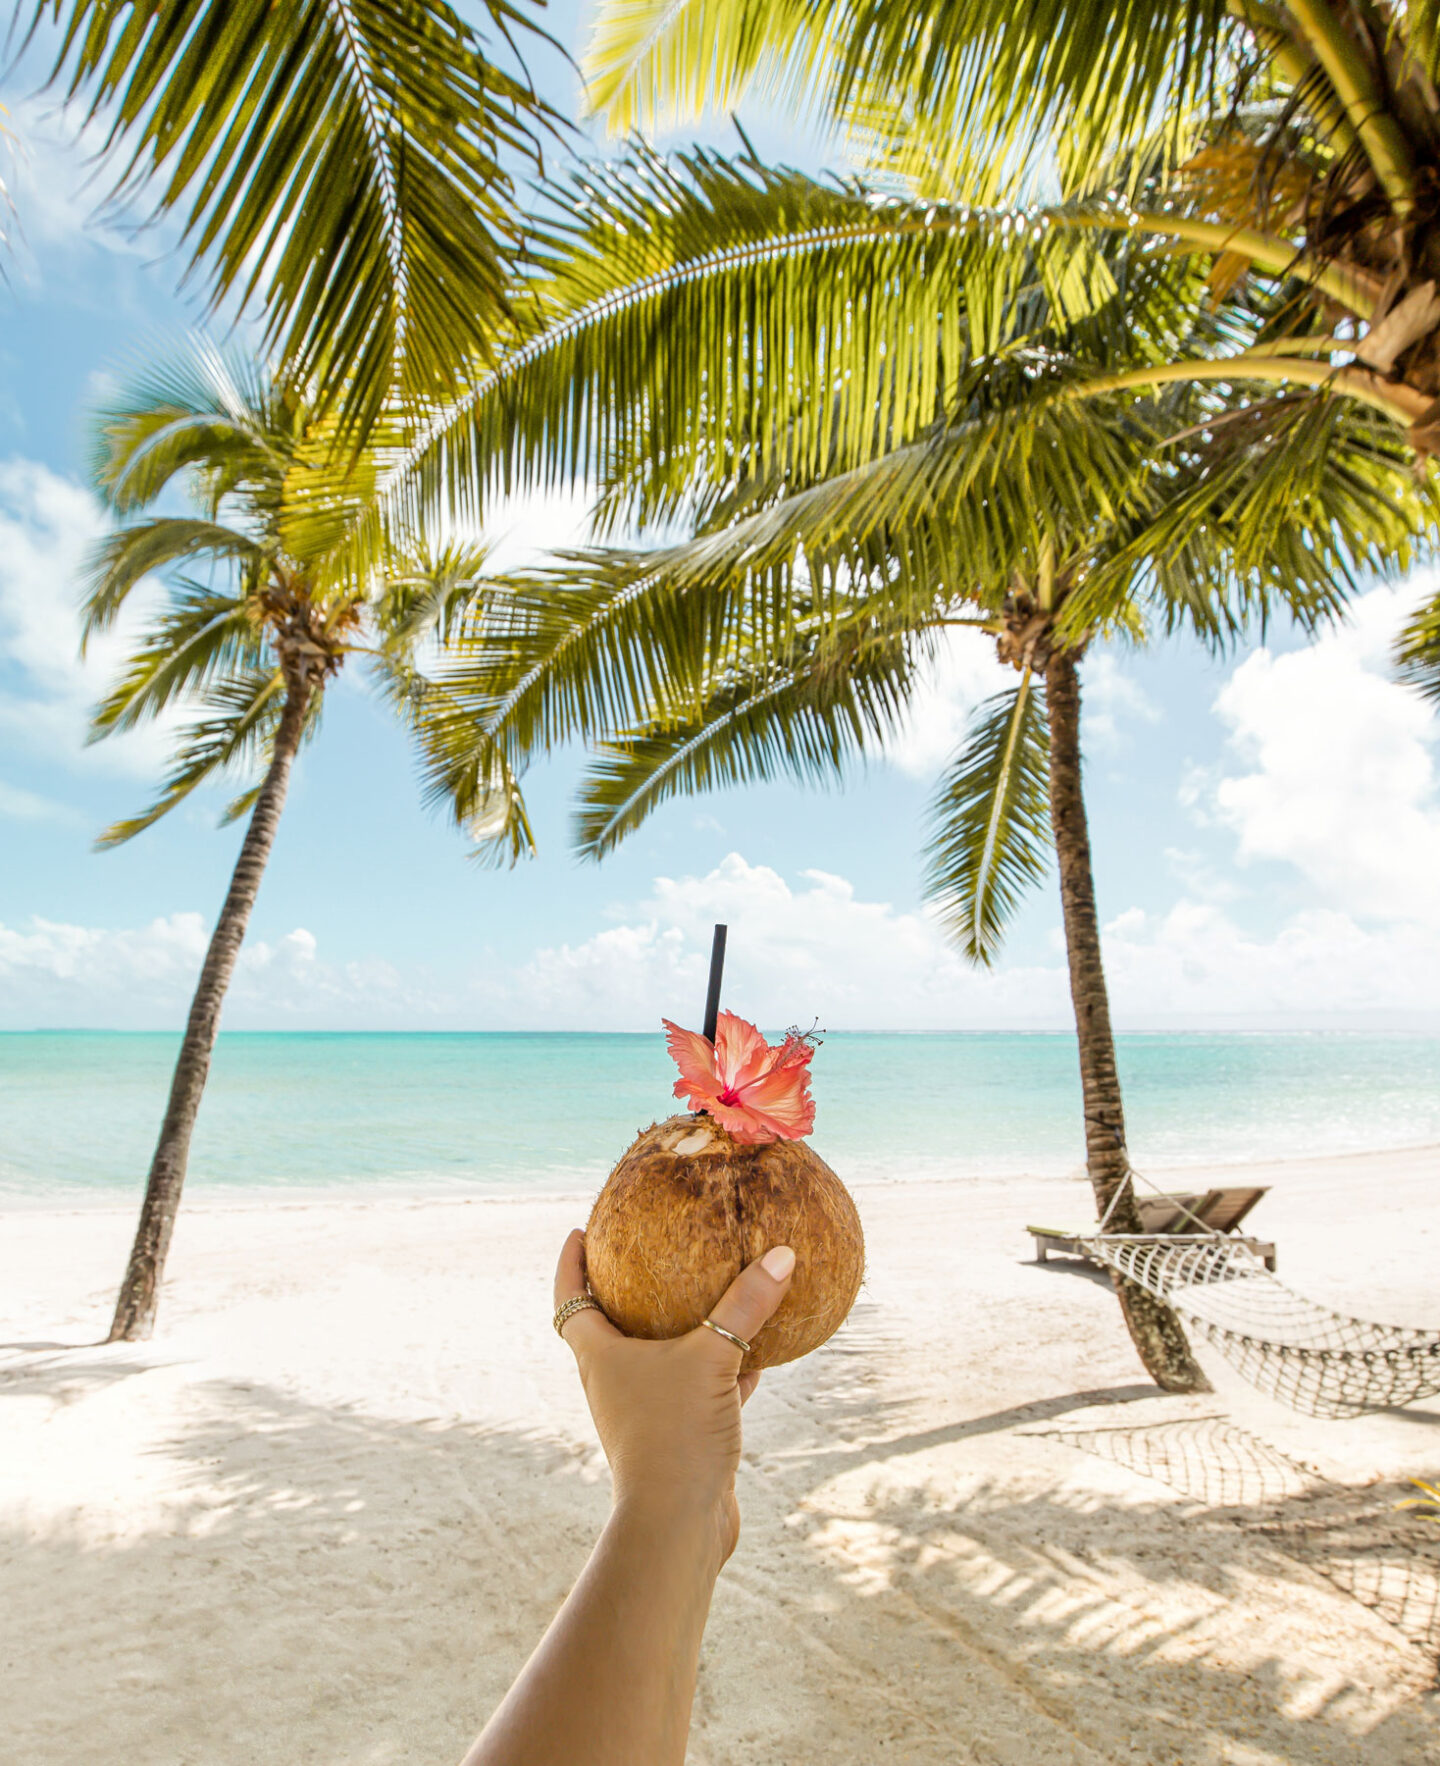 Cook-Islands-Travel-Guide-–-Rarotonga-–-Aitutaki-–-Kelsey-Heinrichs---@kelseyinlondon